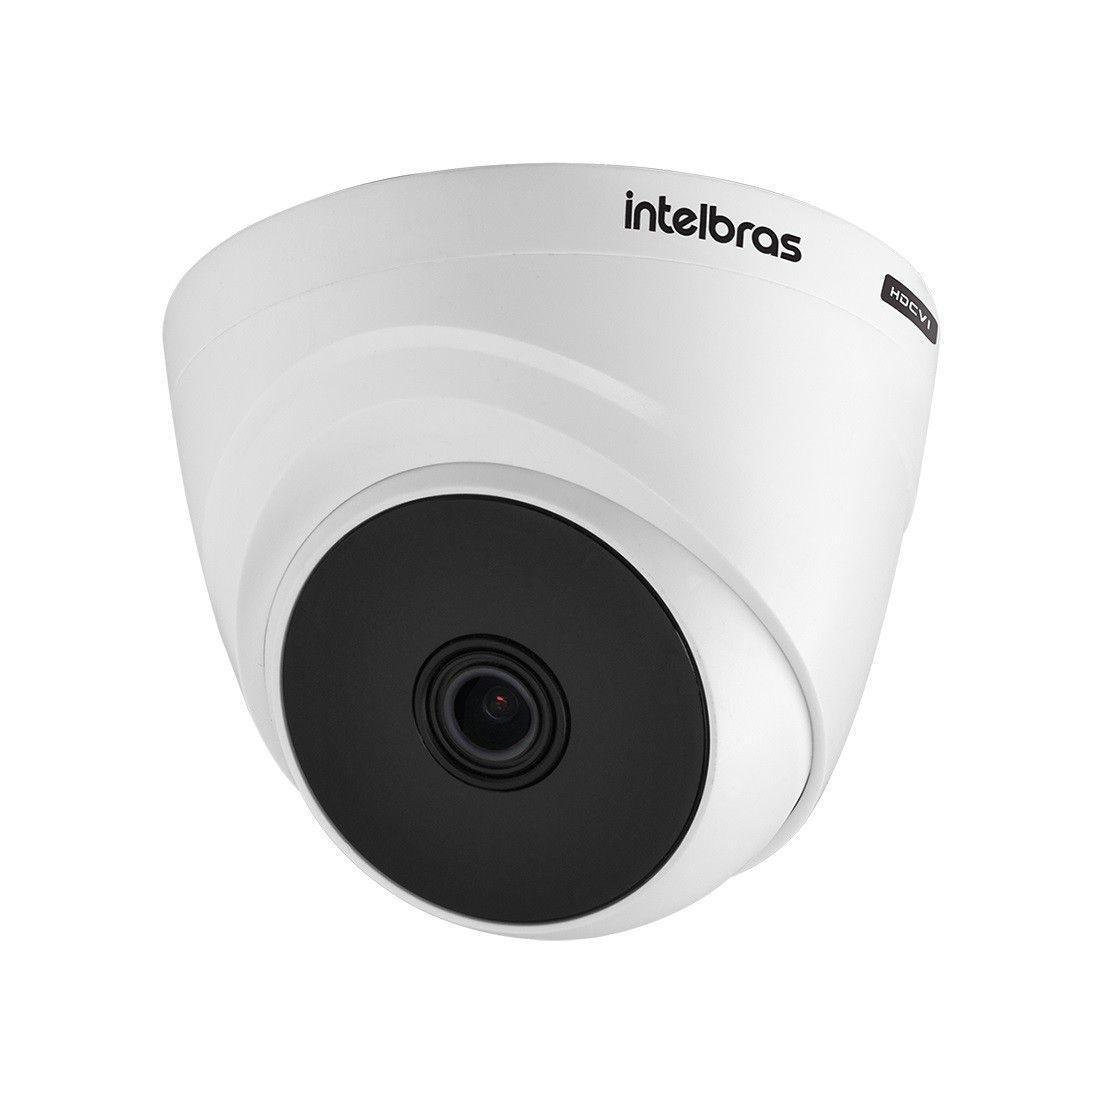 Kit 6 Câmeras Segurança VHL Mista 2 Dome + 4 Bullet HD 720p VHD 1010 G6 + DVR de 8 Canais e HD 1TB